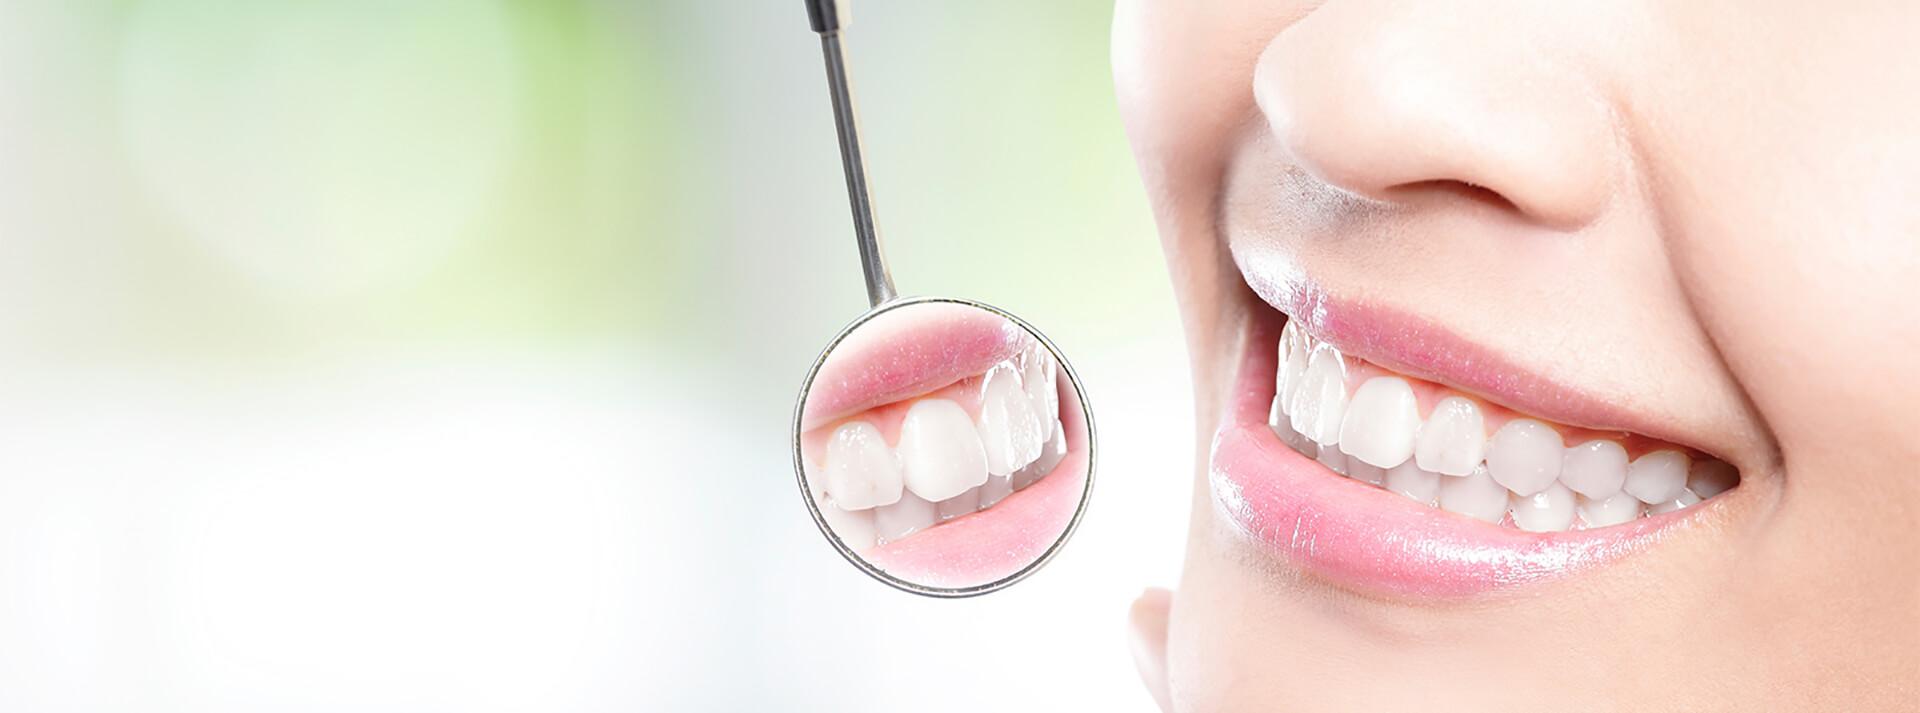 lumident studio stomatološka ordinacija beograd